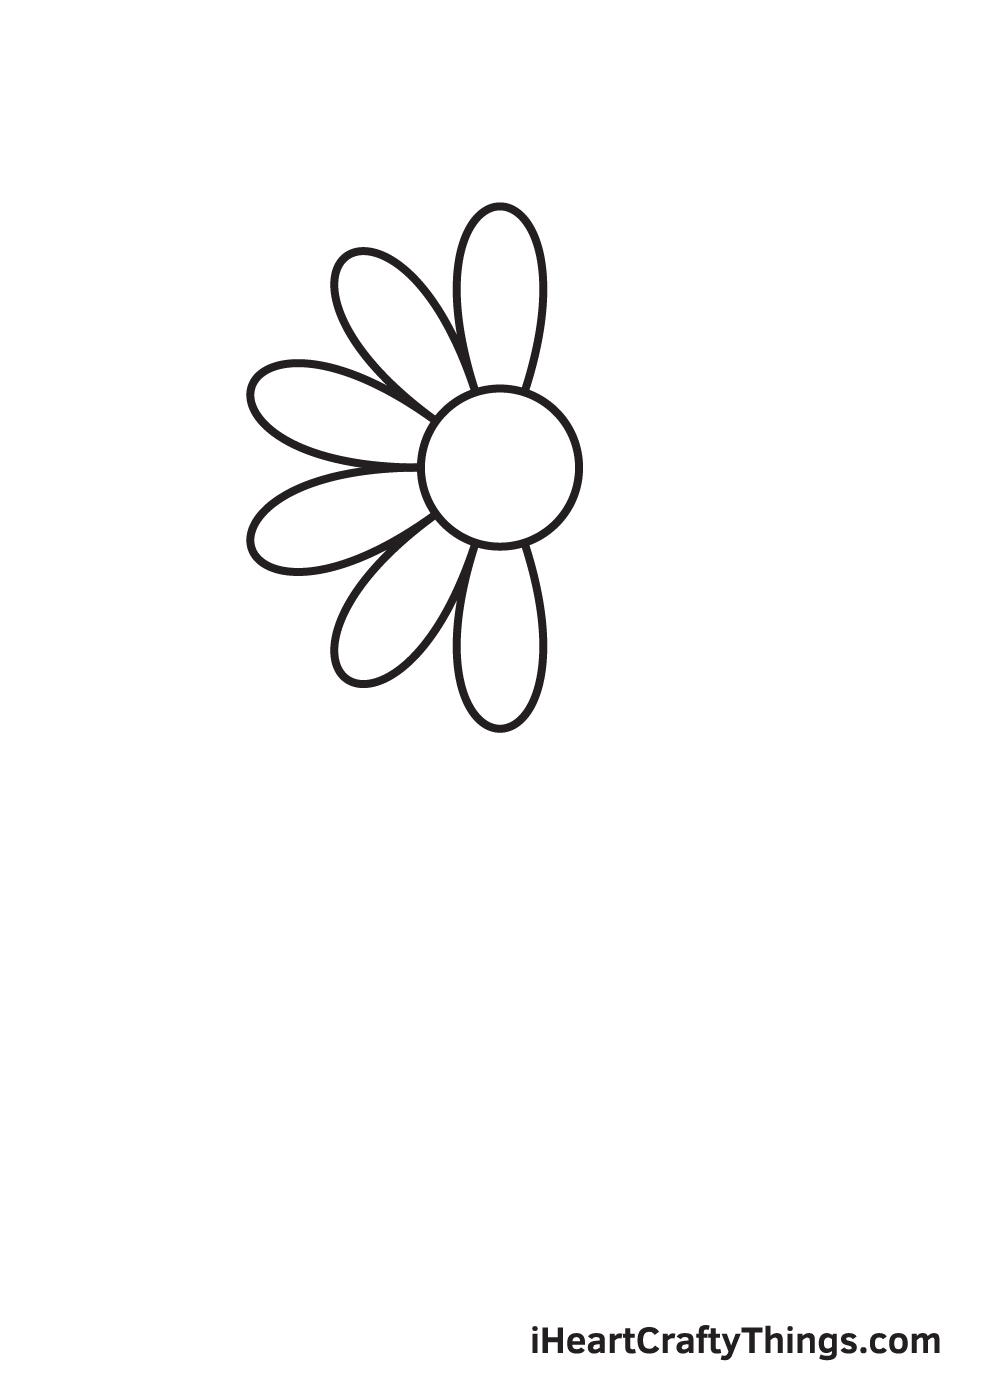 daisy drawing - step 3